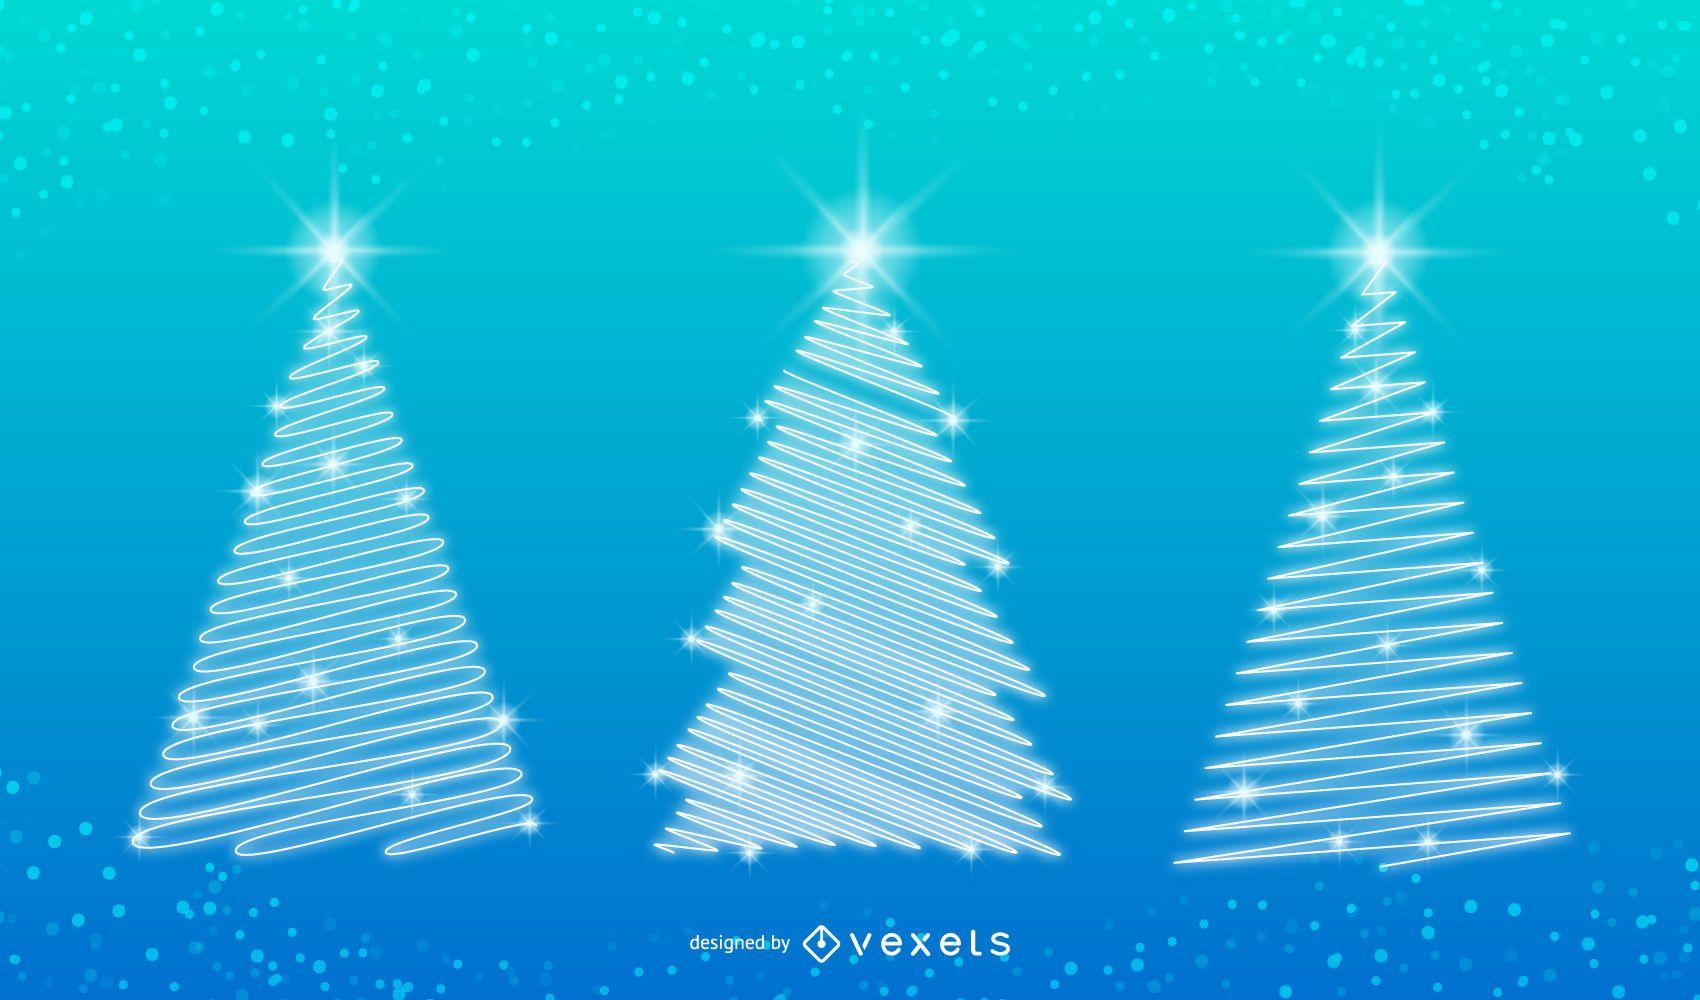 Xmas tree illustrations with snow